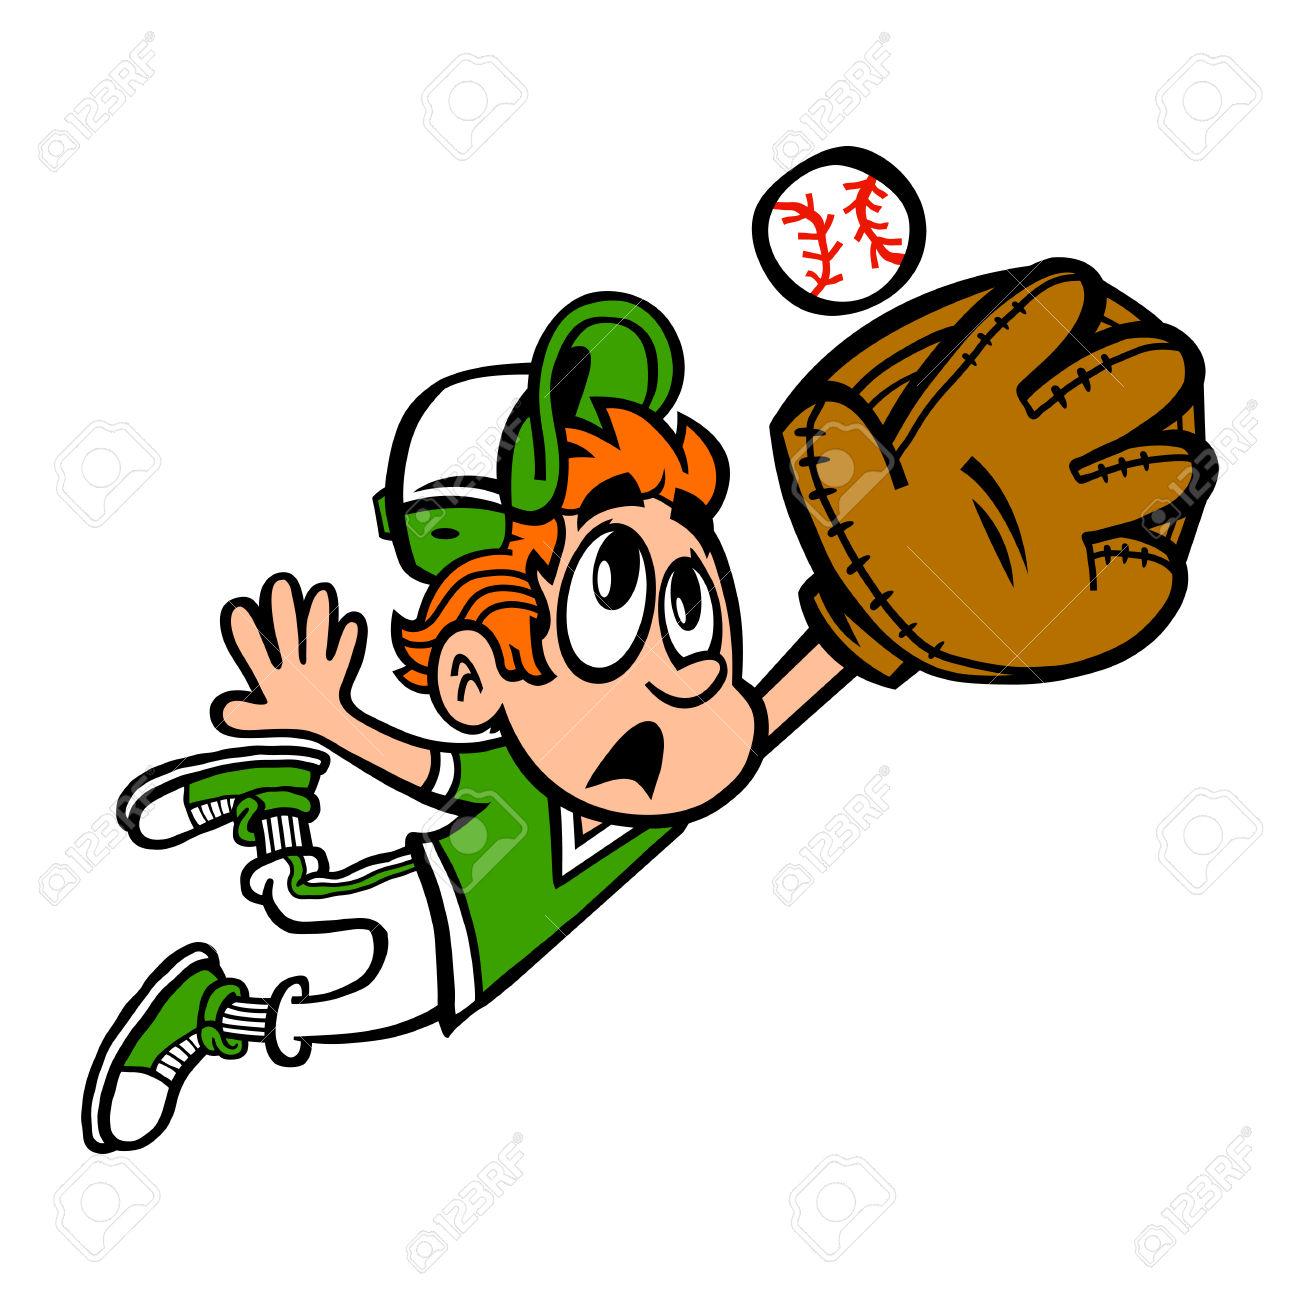 Baseball Player Kid Outfield Vector Cartoon Royalty Free Cliparts.